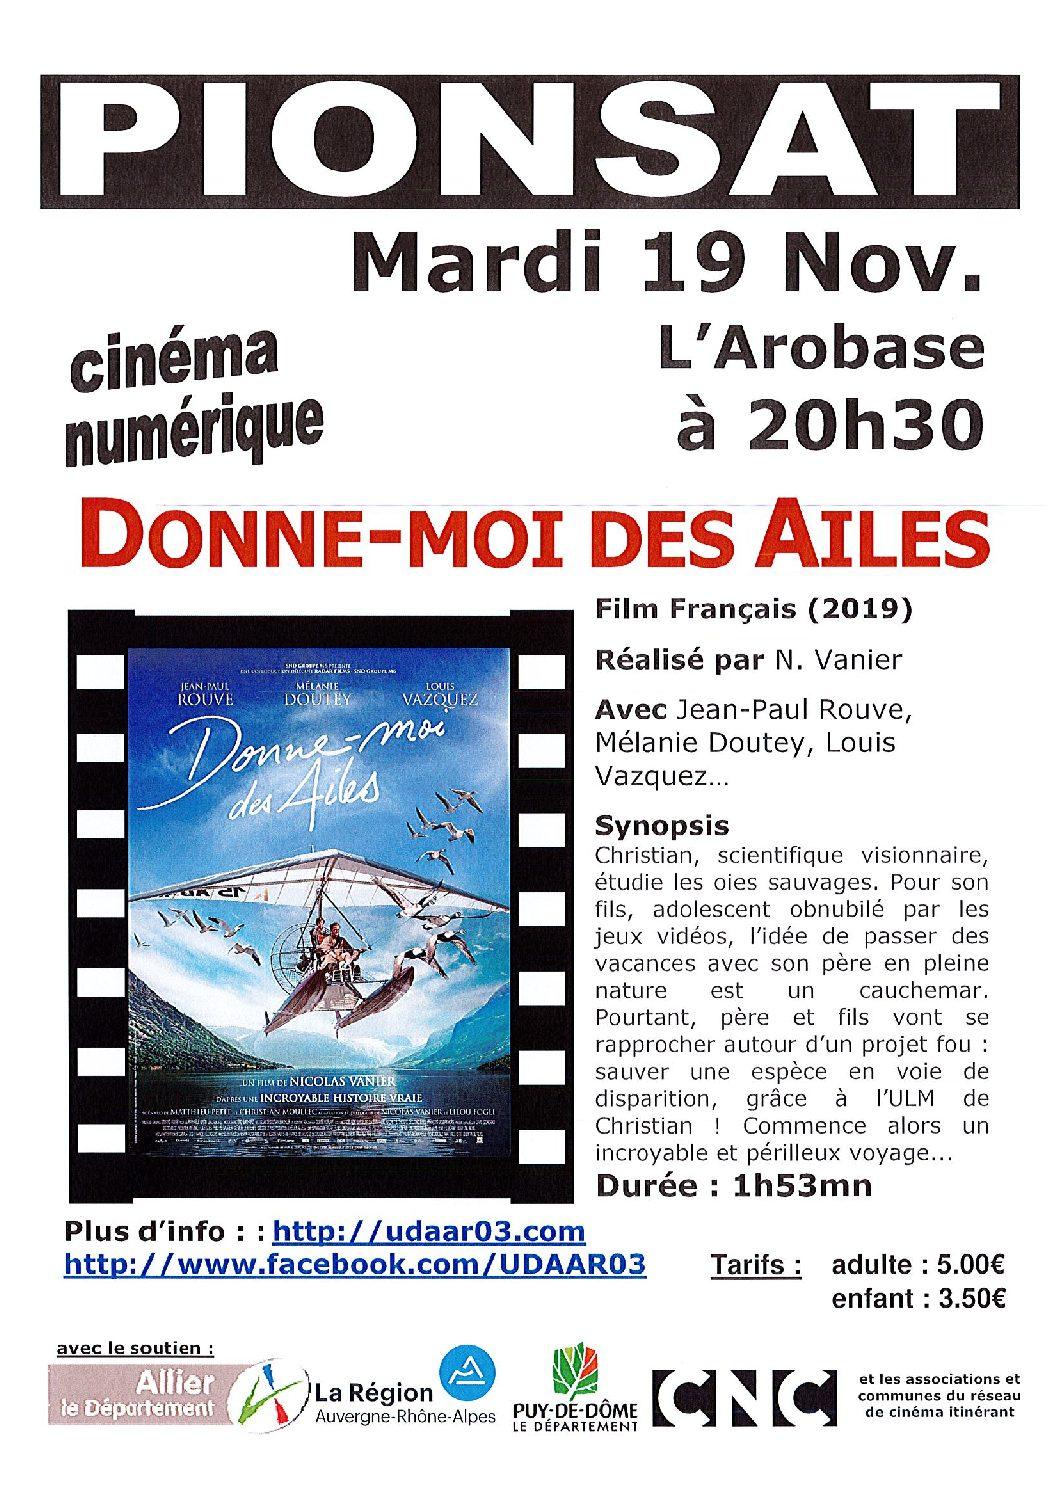 CINEMA DU 19 NOVEMBRE